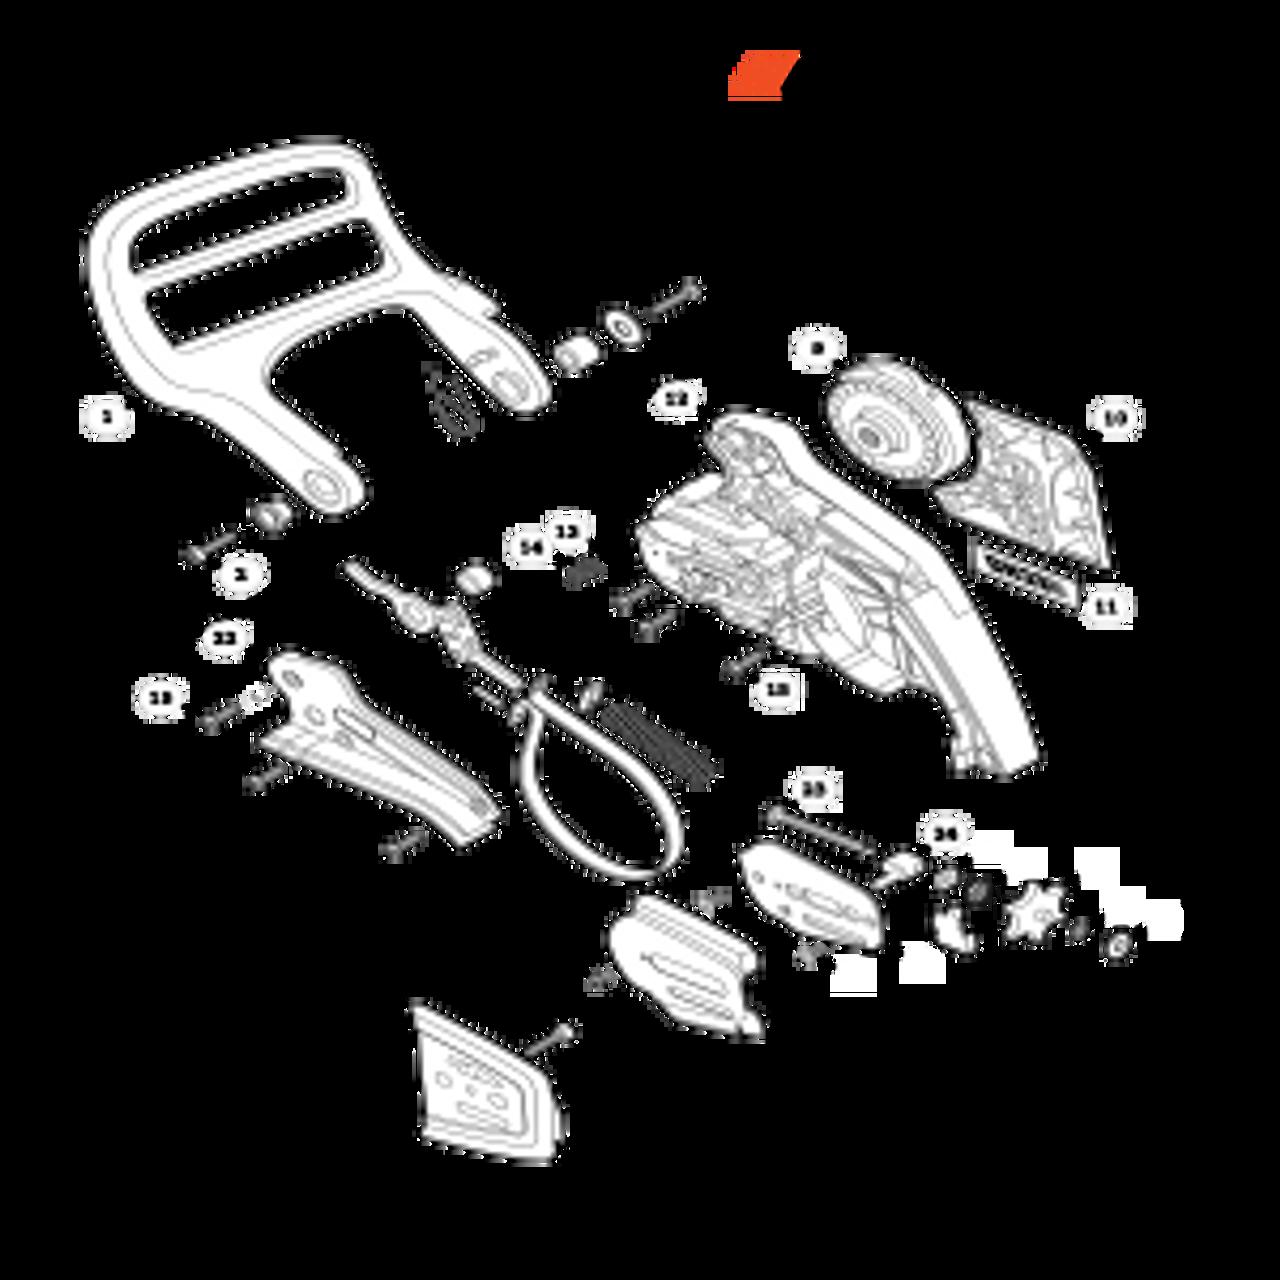 CS-400F SN C27812001001 - C27812999999 - Chain Brake Parts lookup